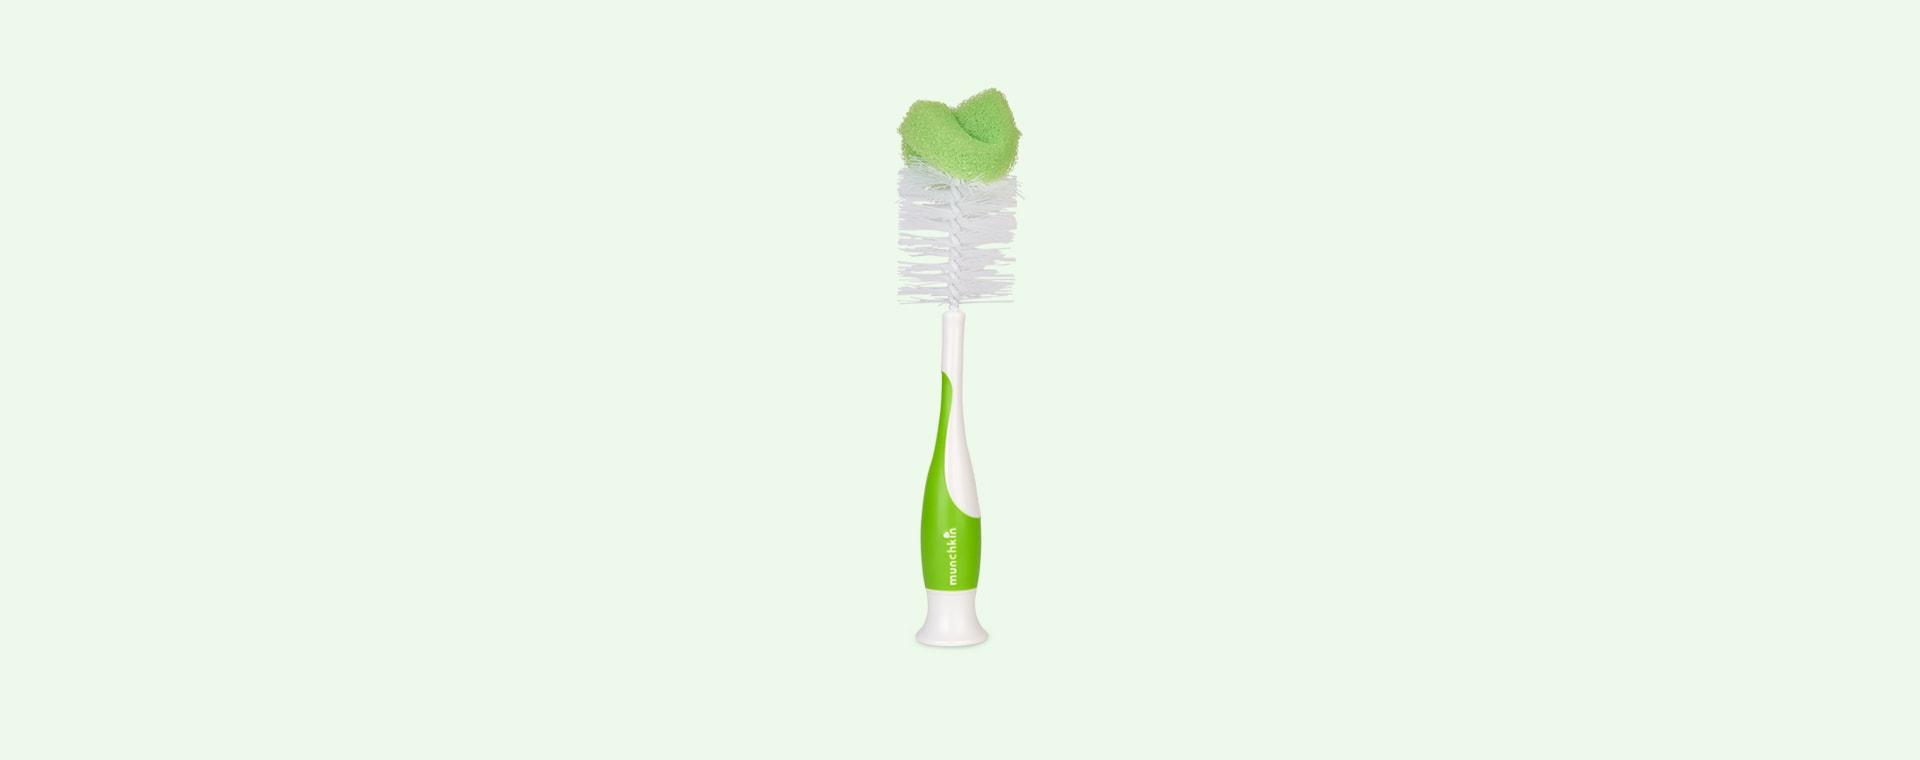 Green Munchkin Bottle and Teat Brush